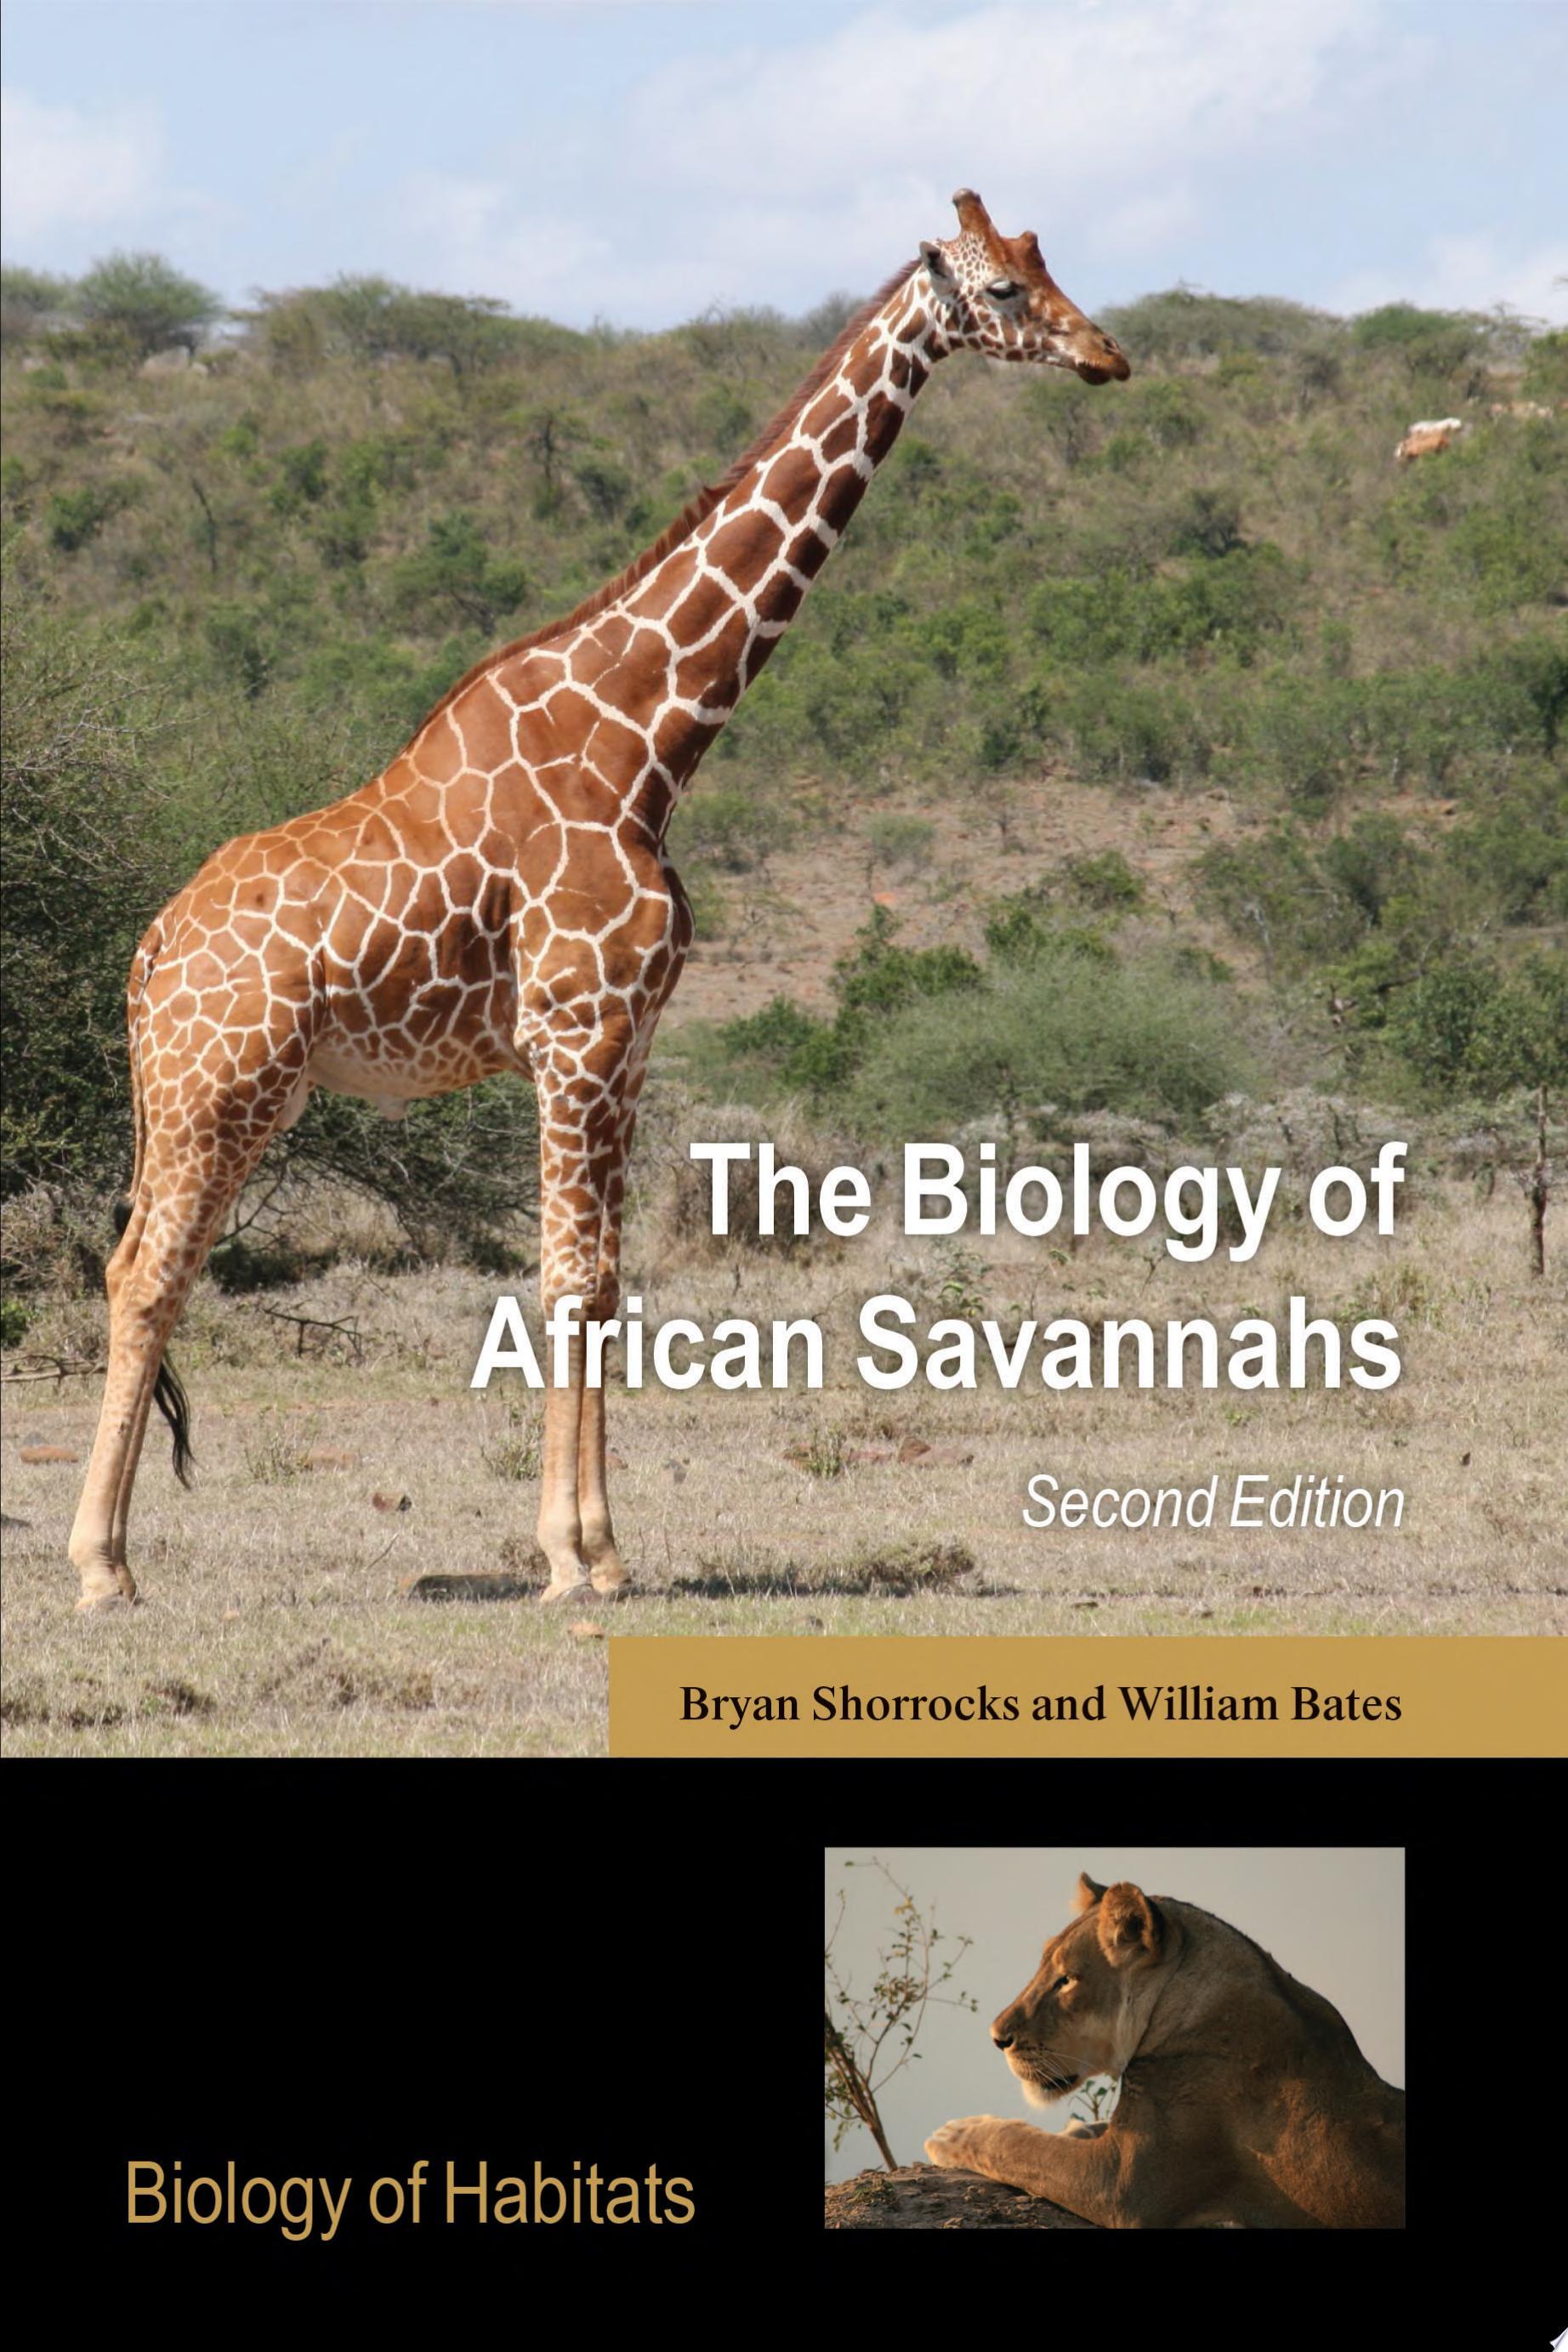 The Biology of African Savannahs